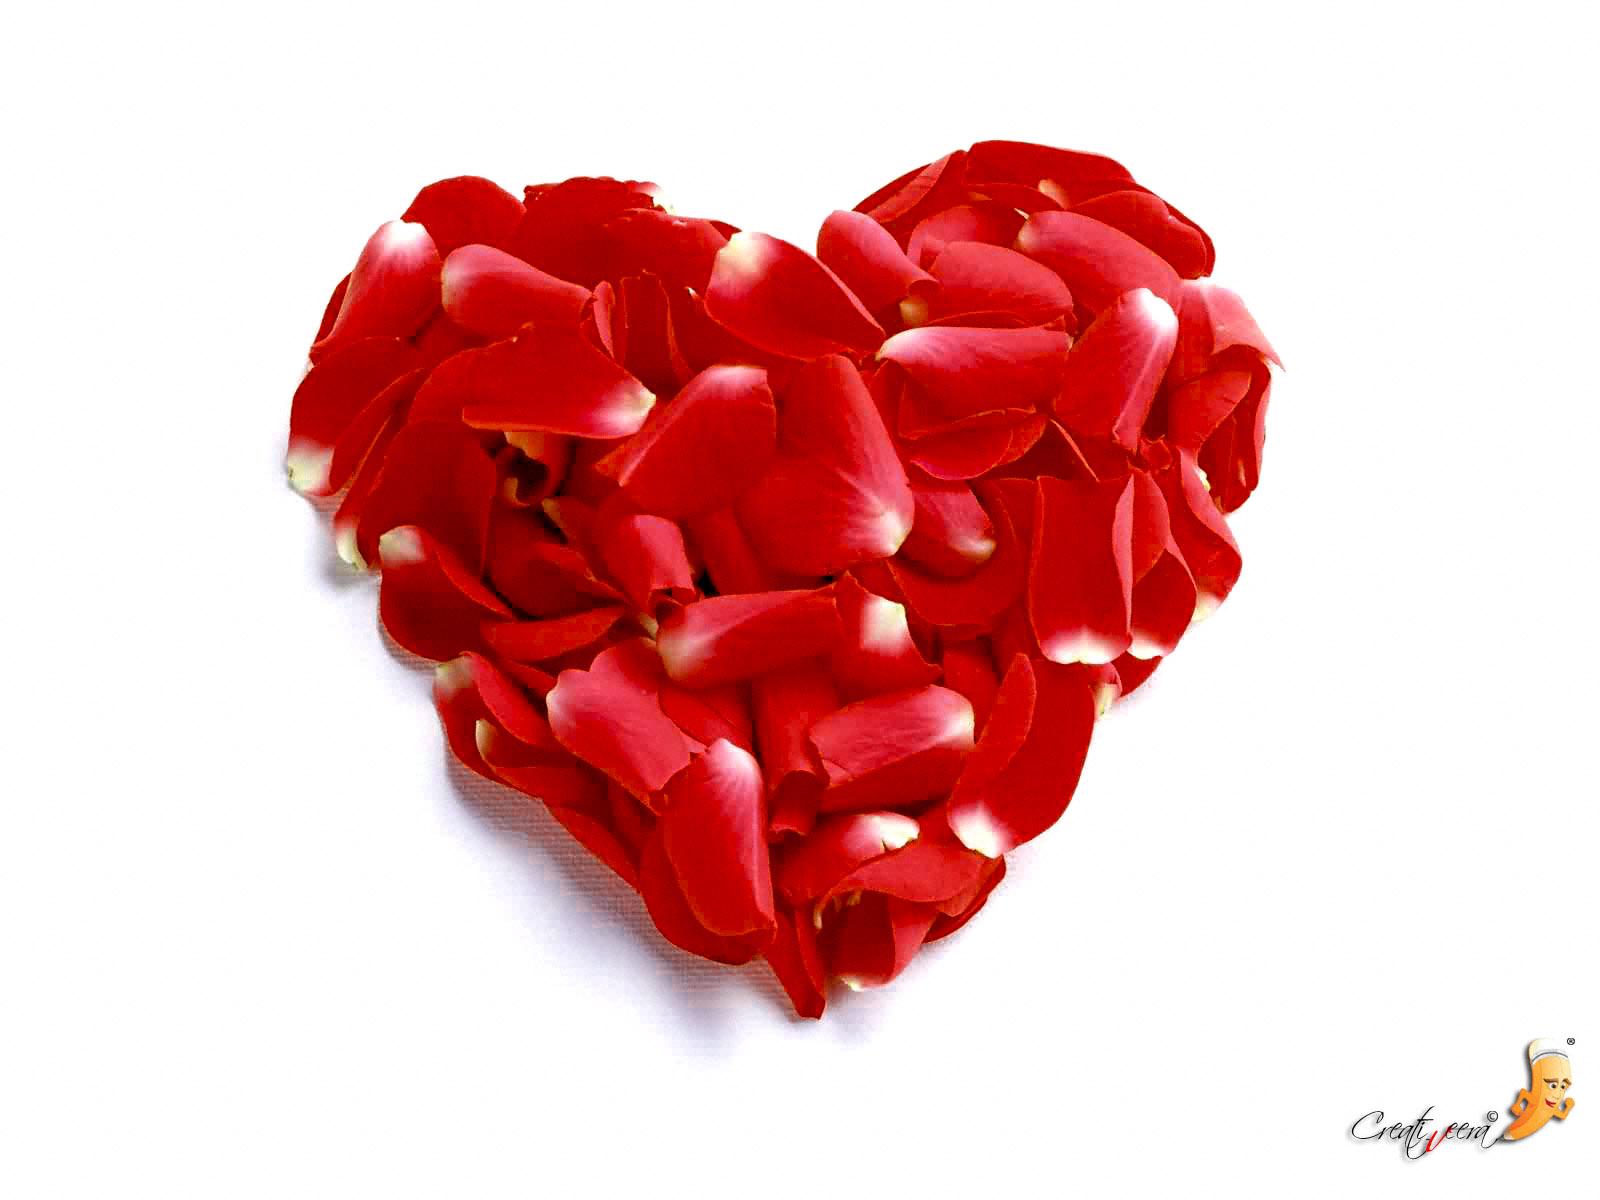 http://4.bp.blogspot.com/-wHuhyYaWcsQ/TzYARJT7WsI/AAAAAAAAAy4/kL8x8MIdboI/s1600/valentine-day-flower-hearts-005.jpg